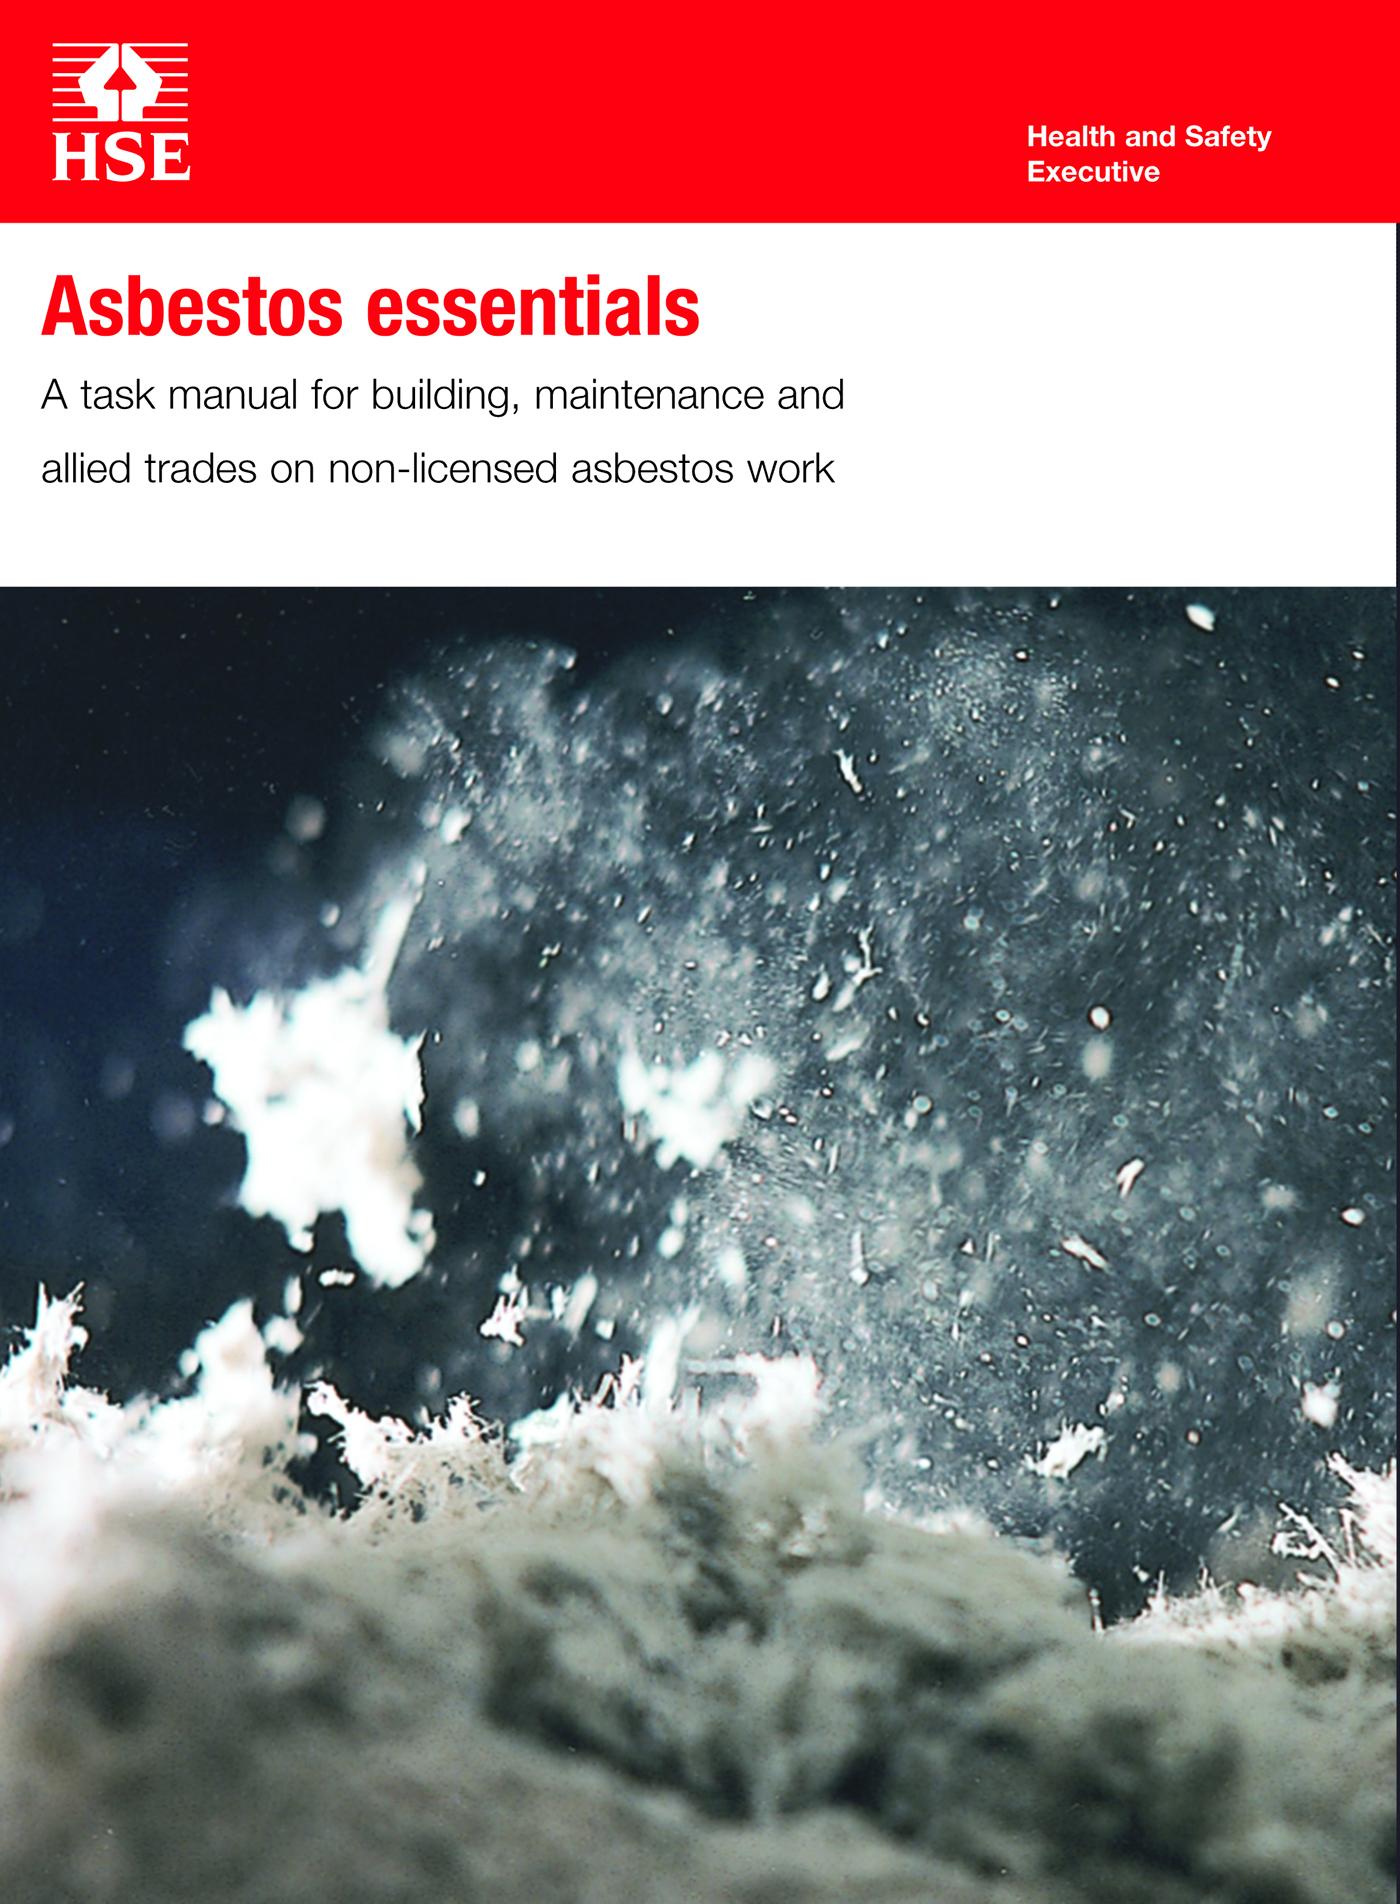 Asbestos Essentials Hse Publication Hsg210 On Behance